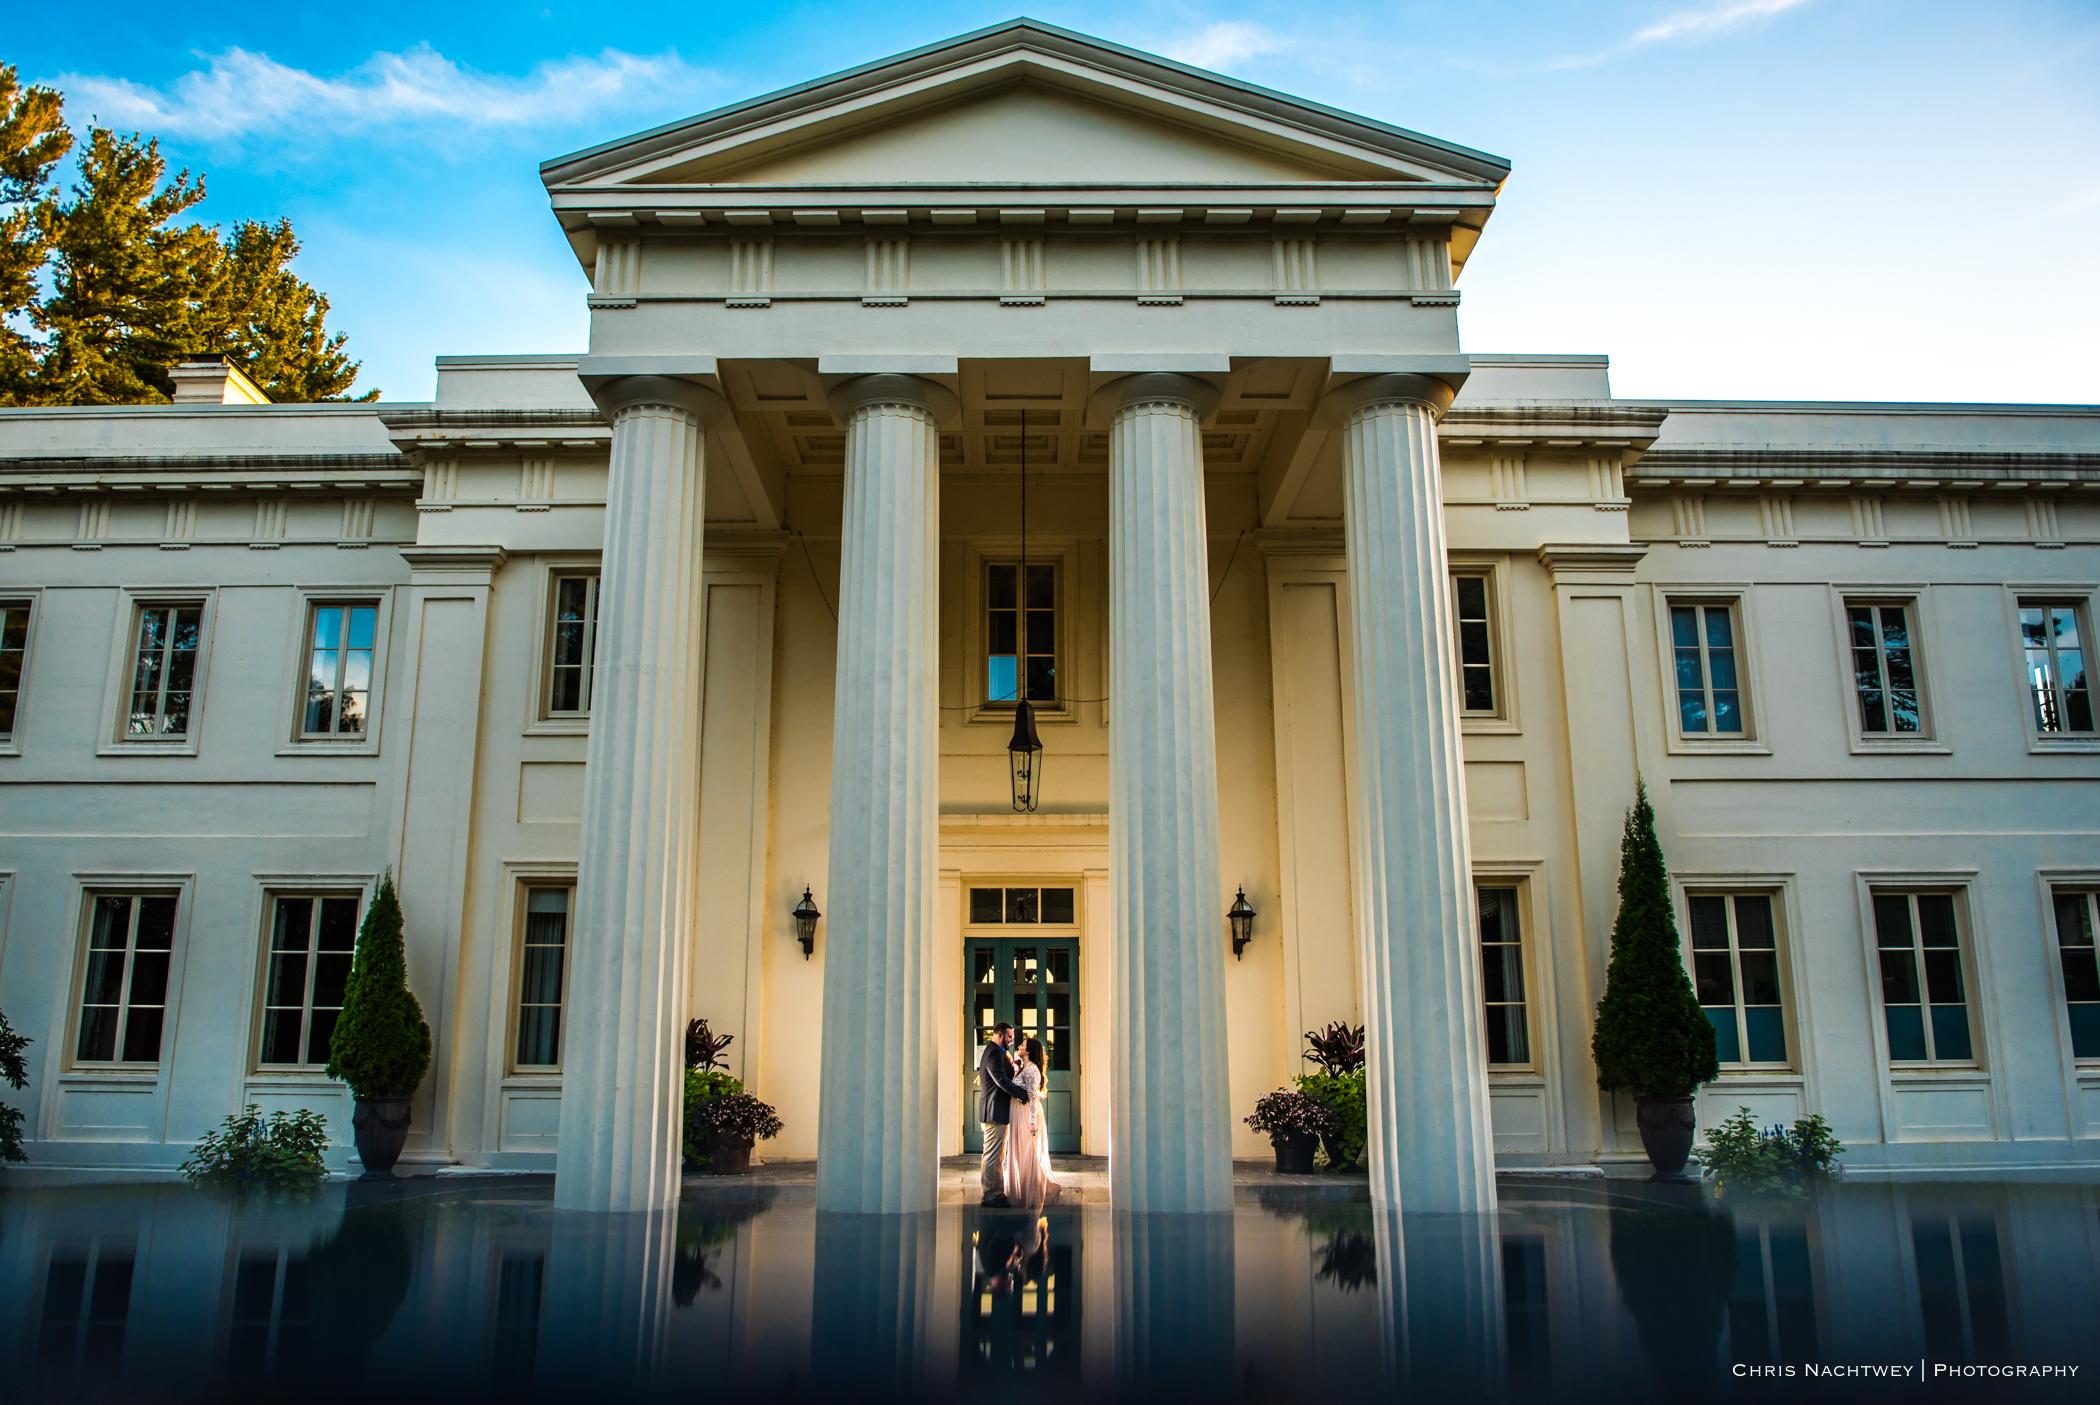 engagement-photos-wadsworth-mansion-ct-chris-nachtwey-photography-2017-11.jpg